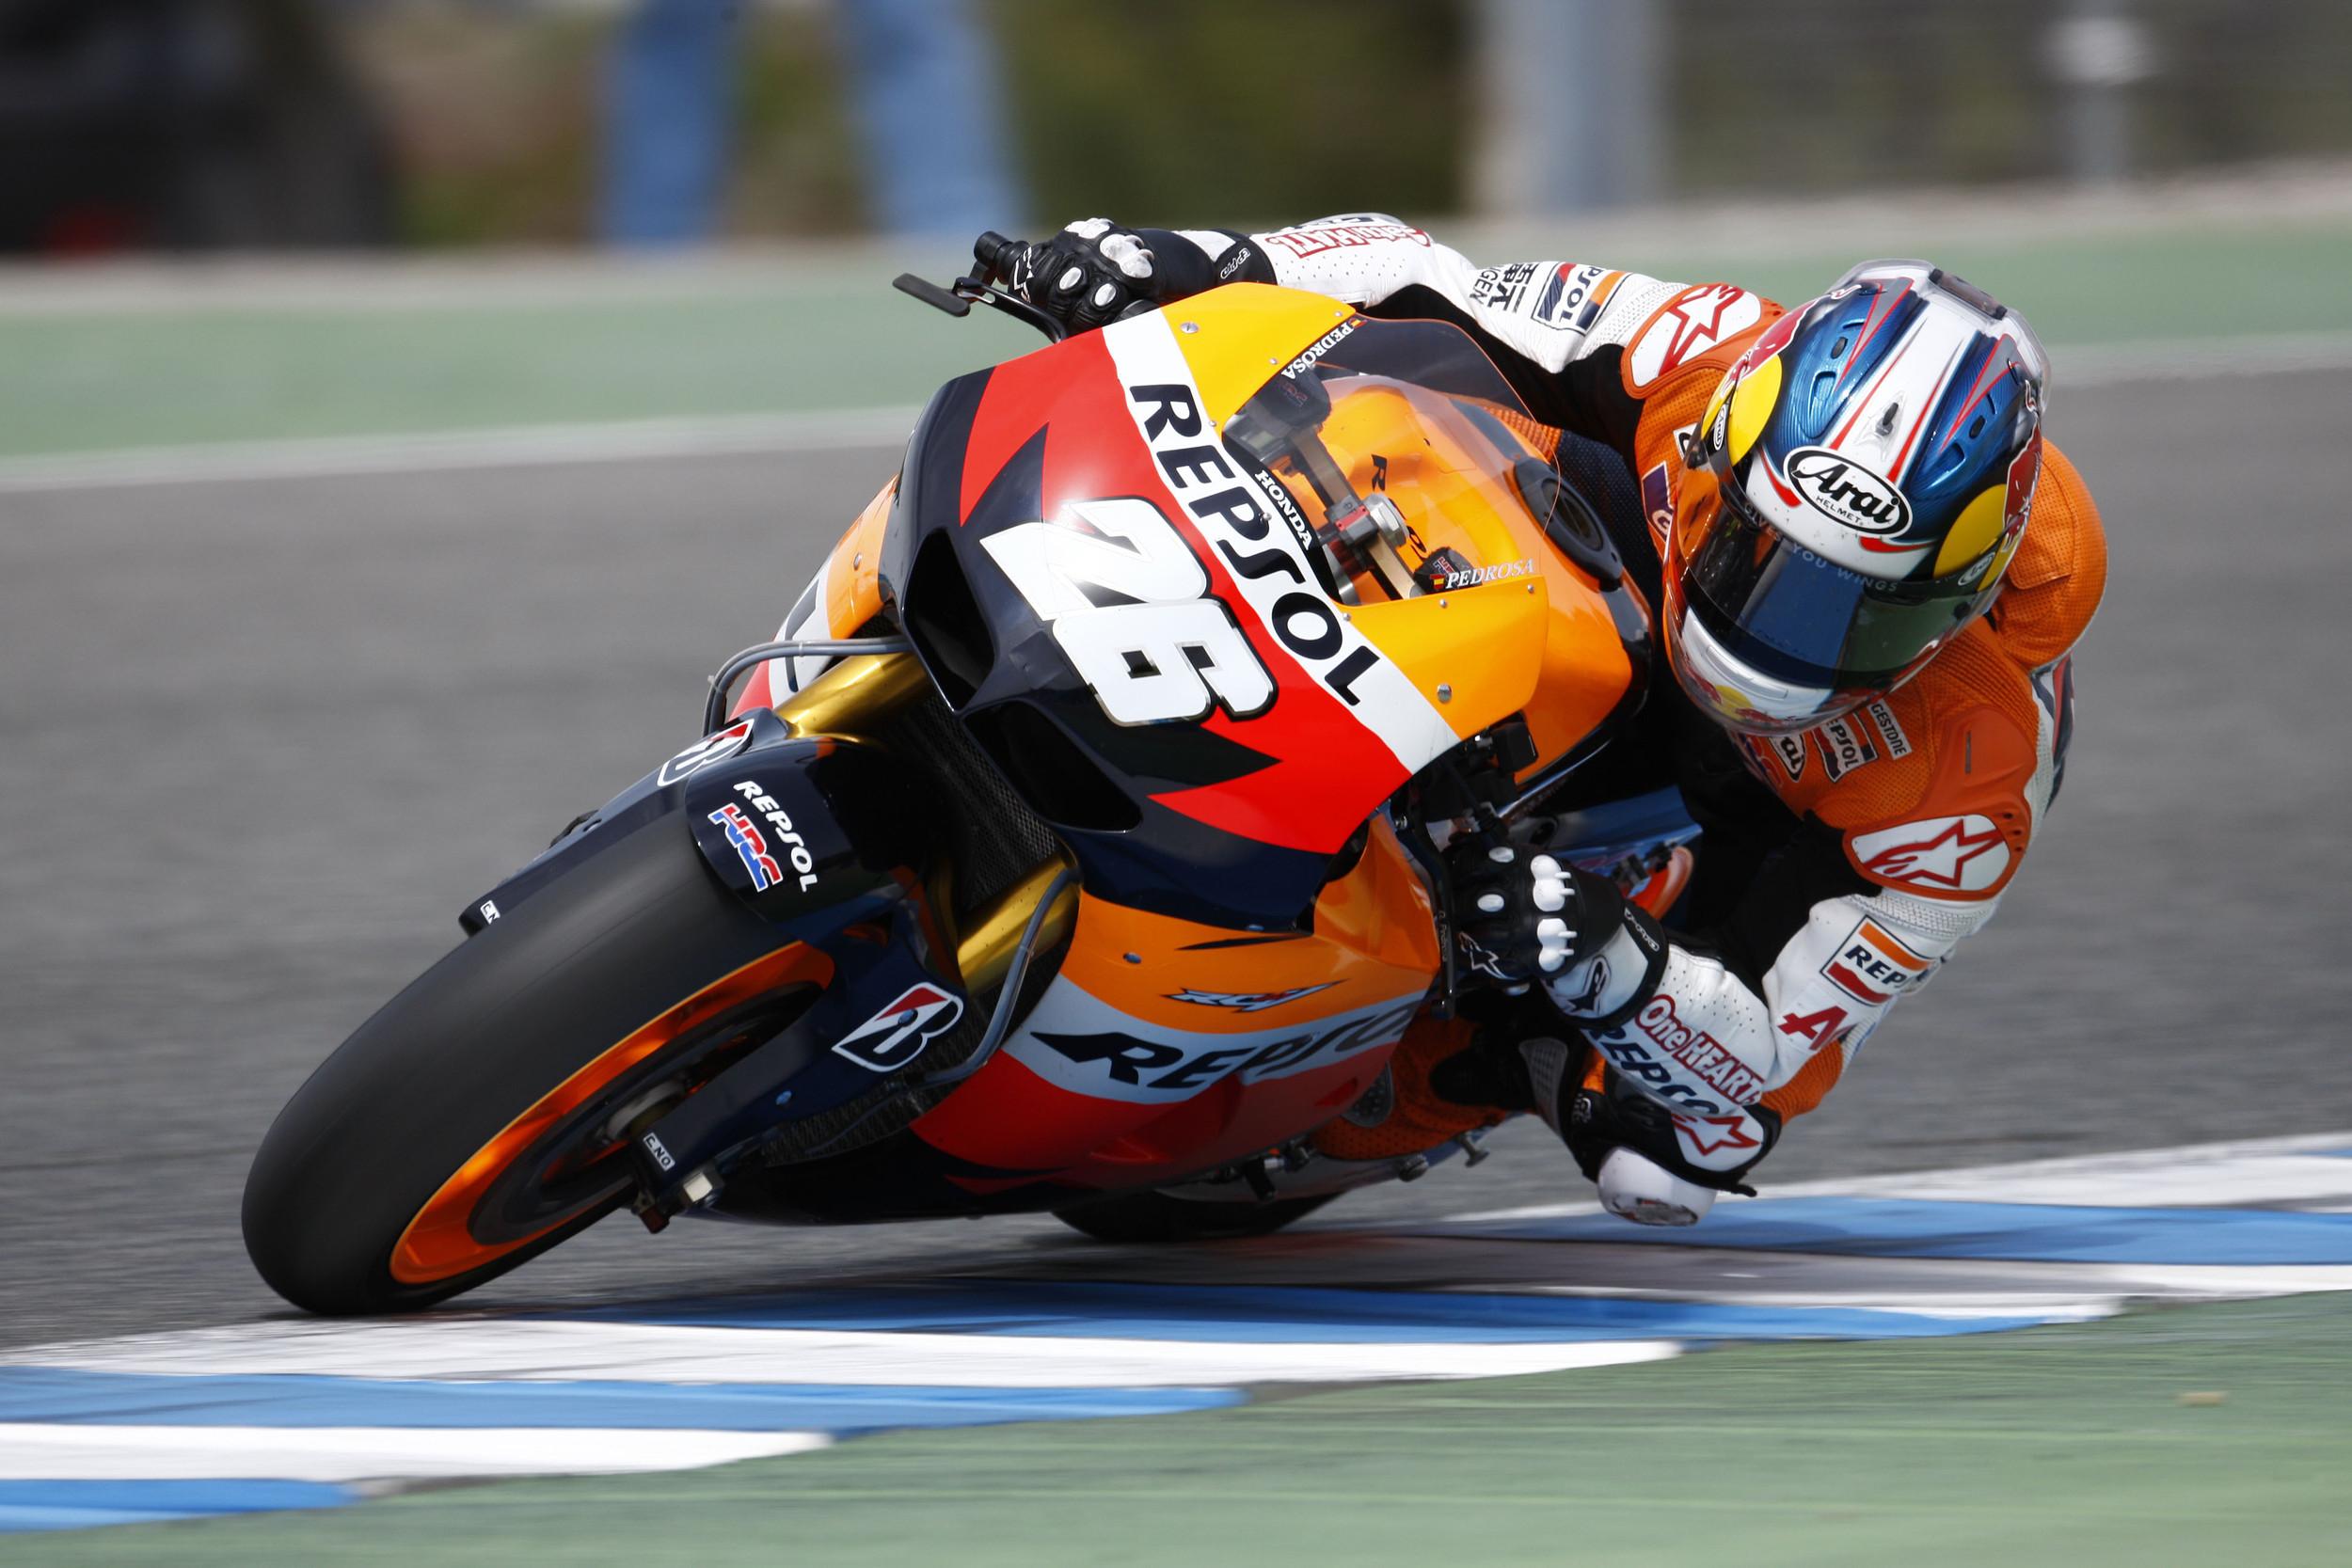 Dani Pedrosa Wallpaper Background MotoGP 2500x1667